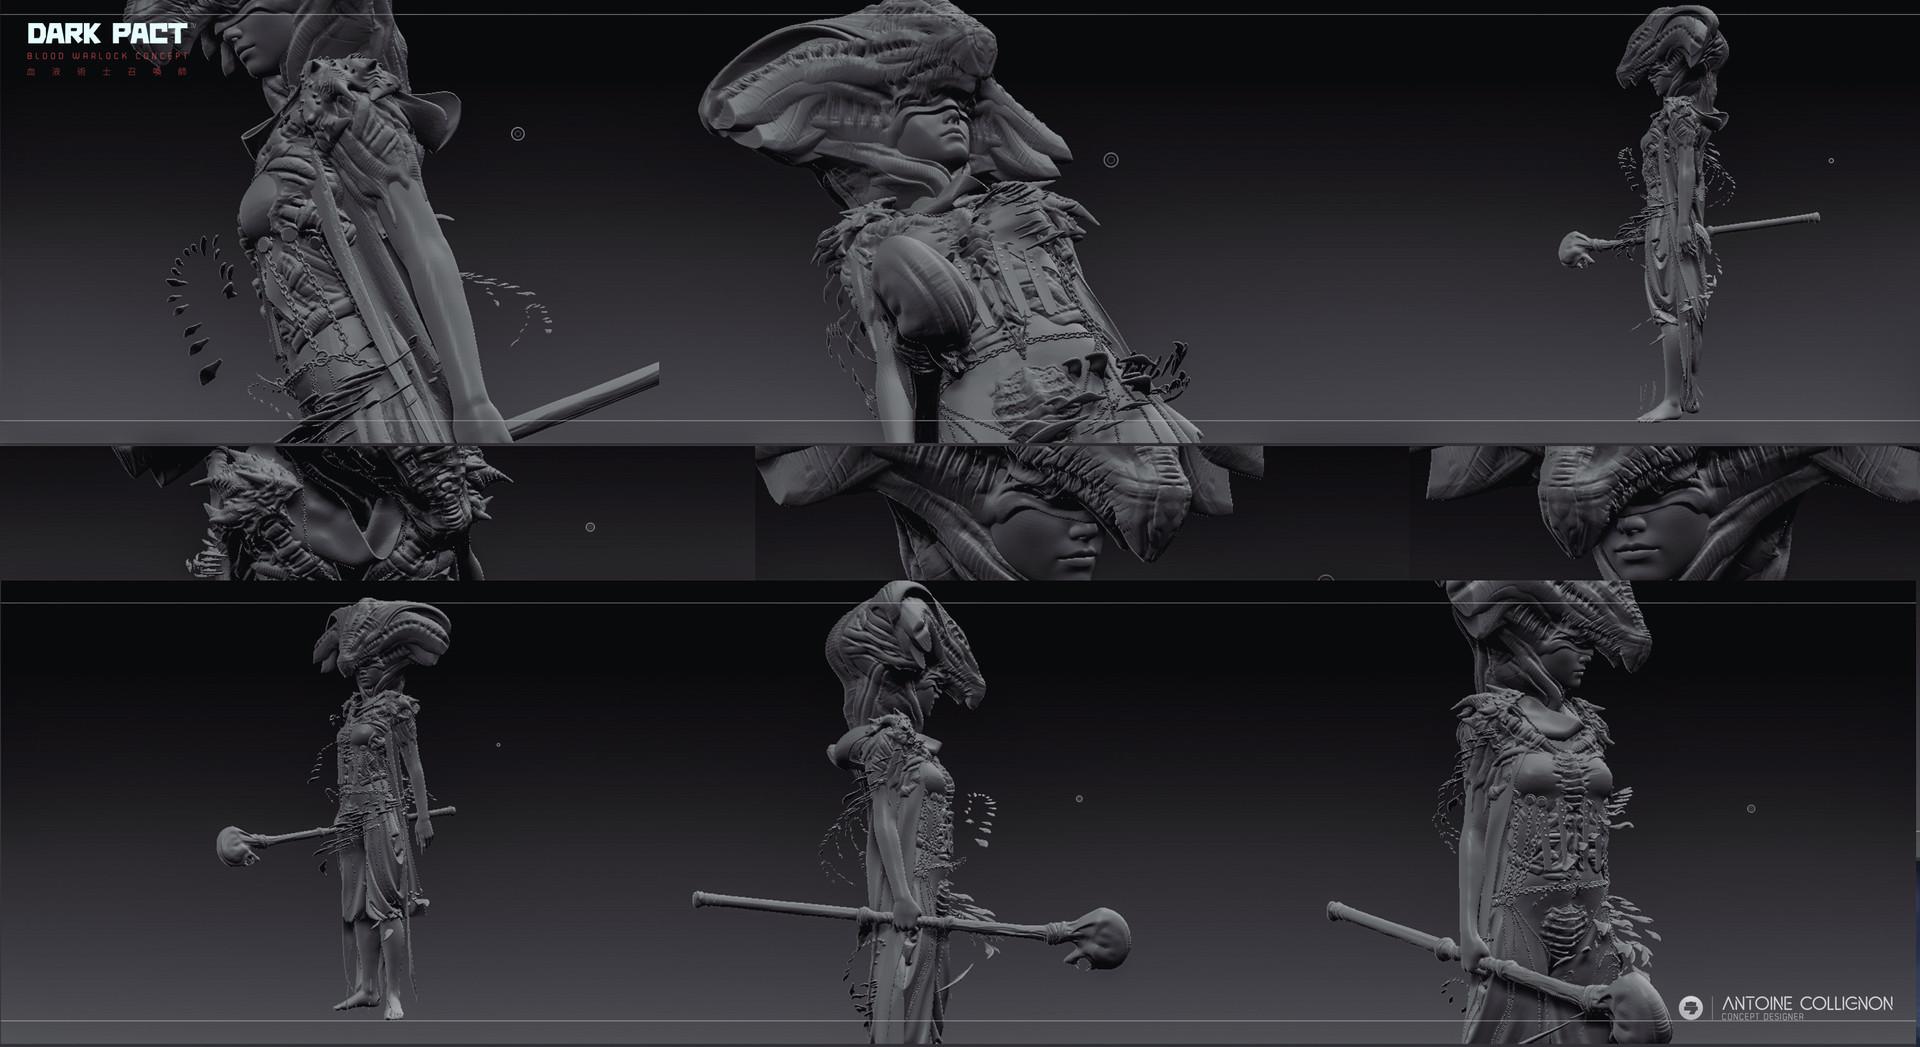 Antoine collignon dark pact characterdesign mmo bloodwarlock by antoine collignon 8 1